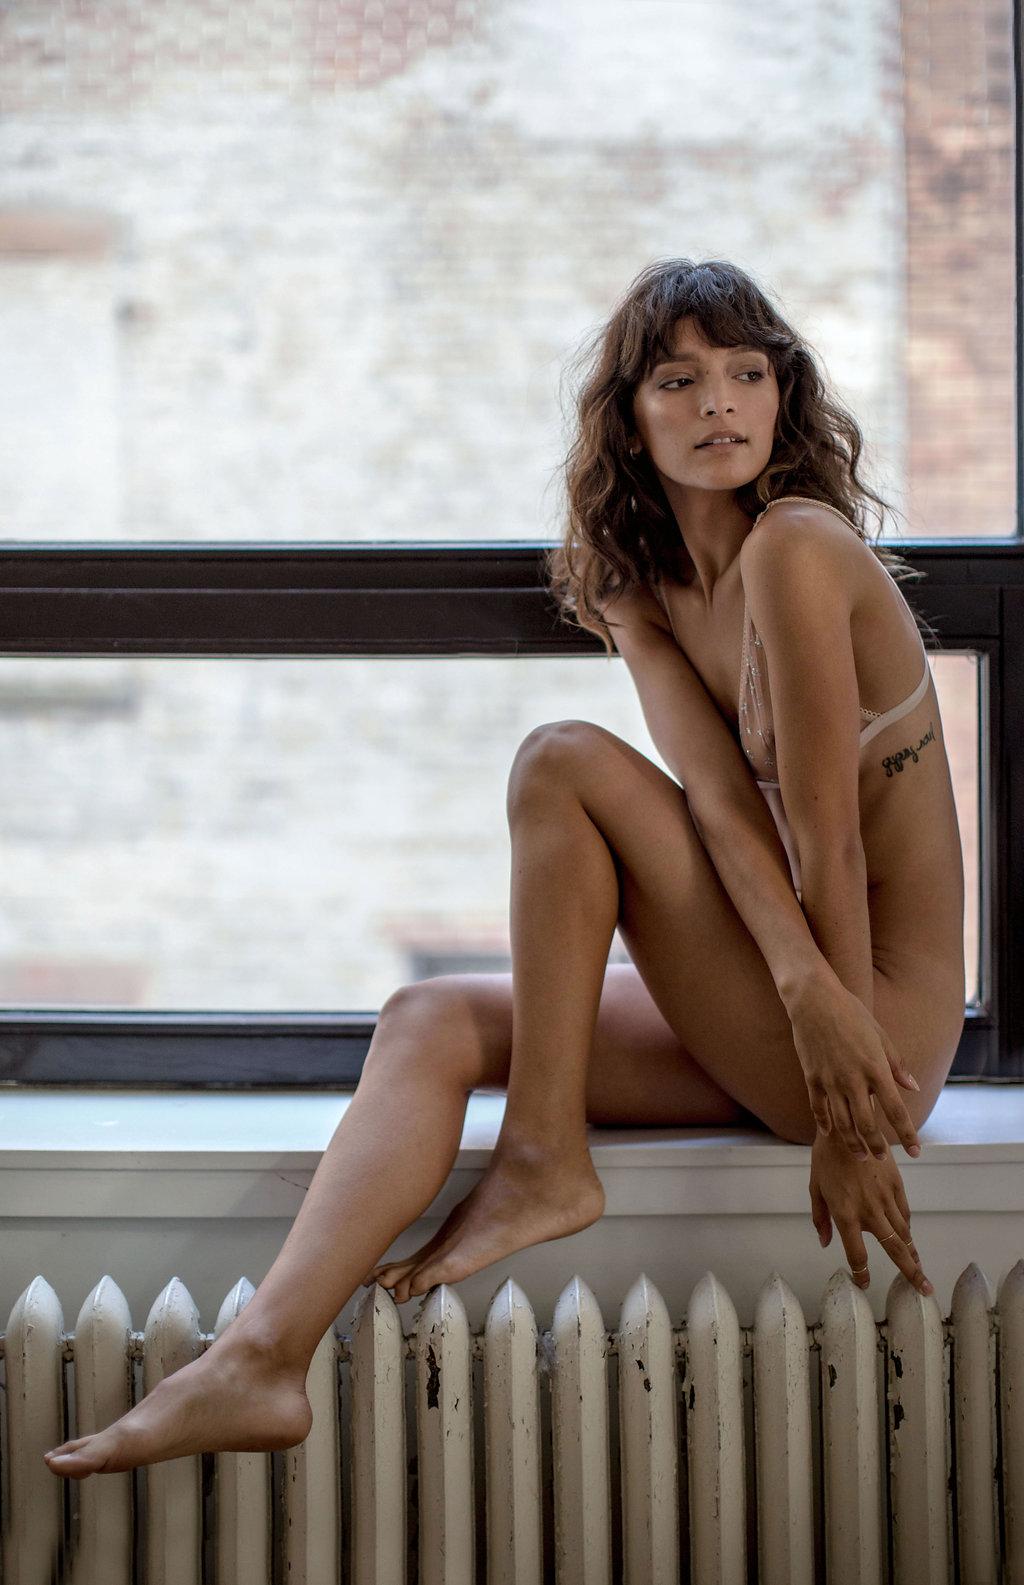 Jen_Senn_Erica_Candice_Playboy_-2009.jpg